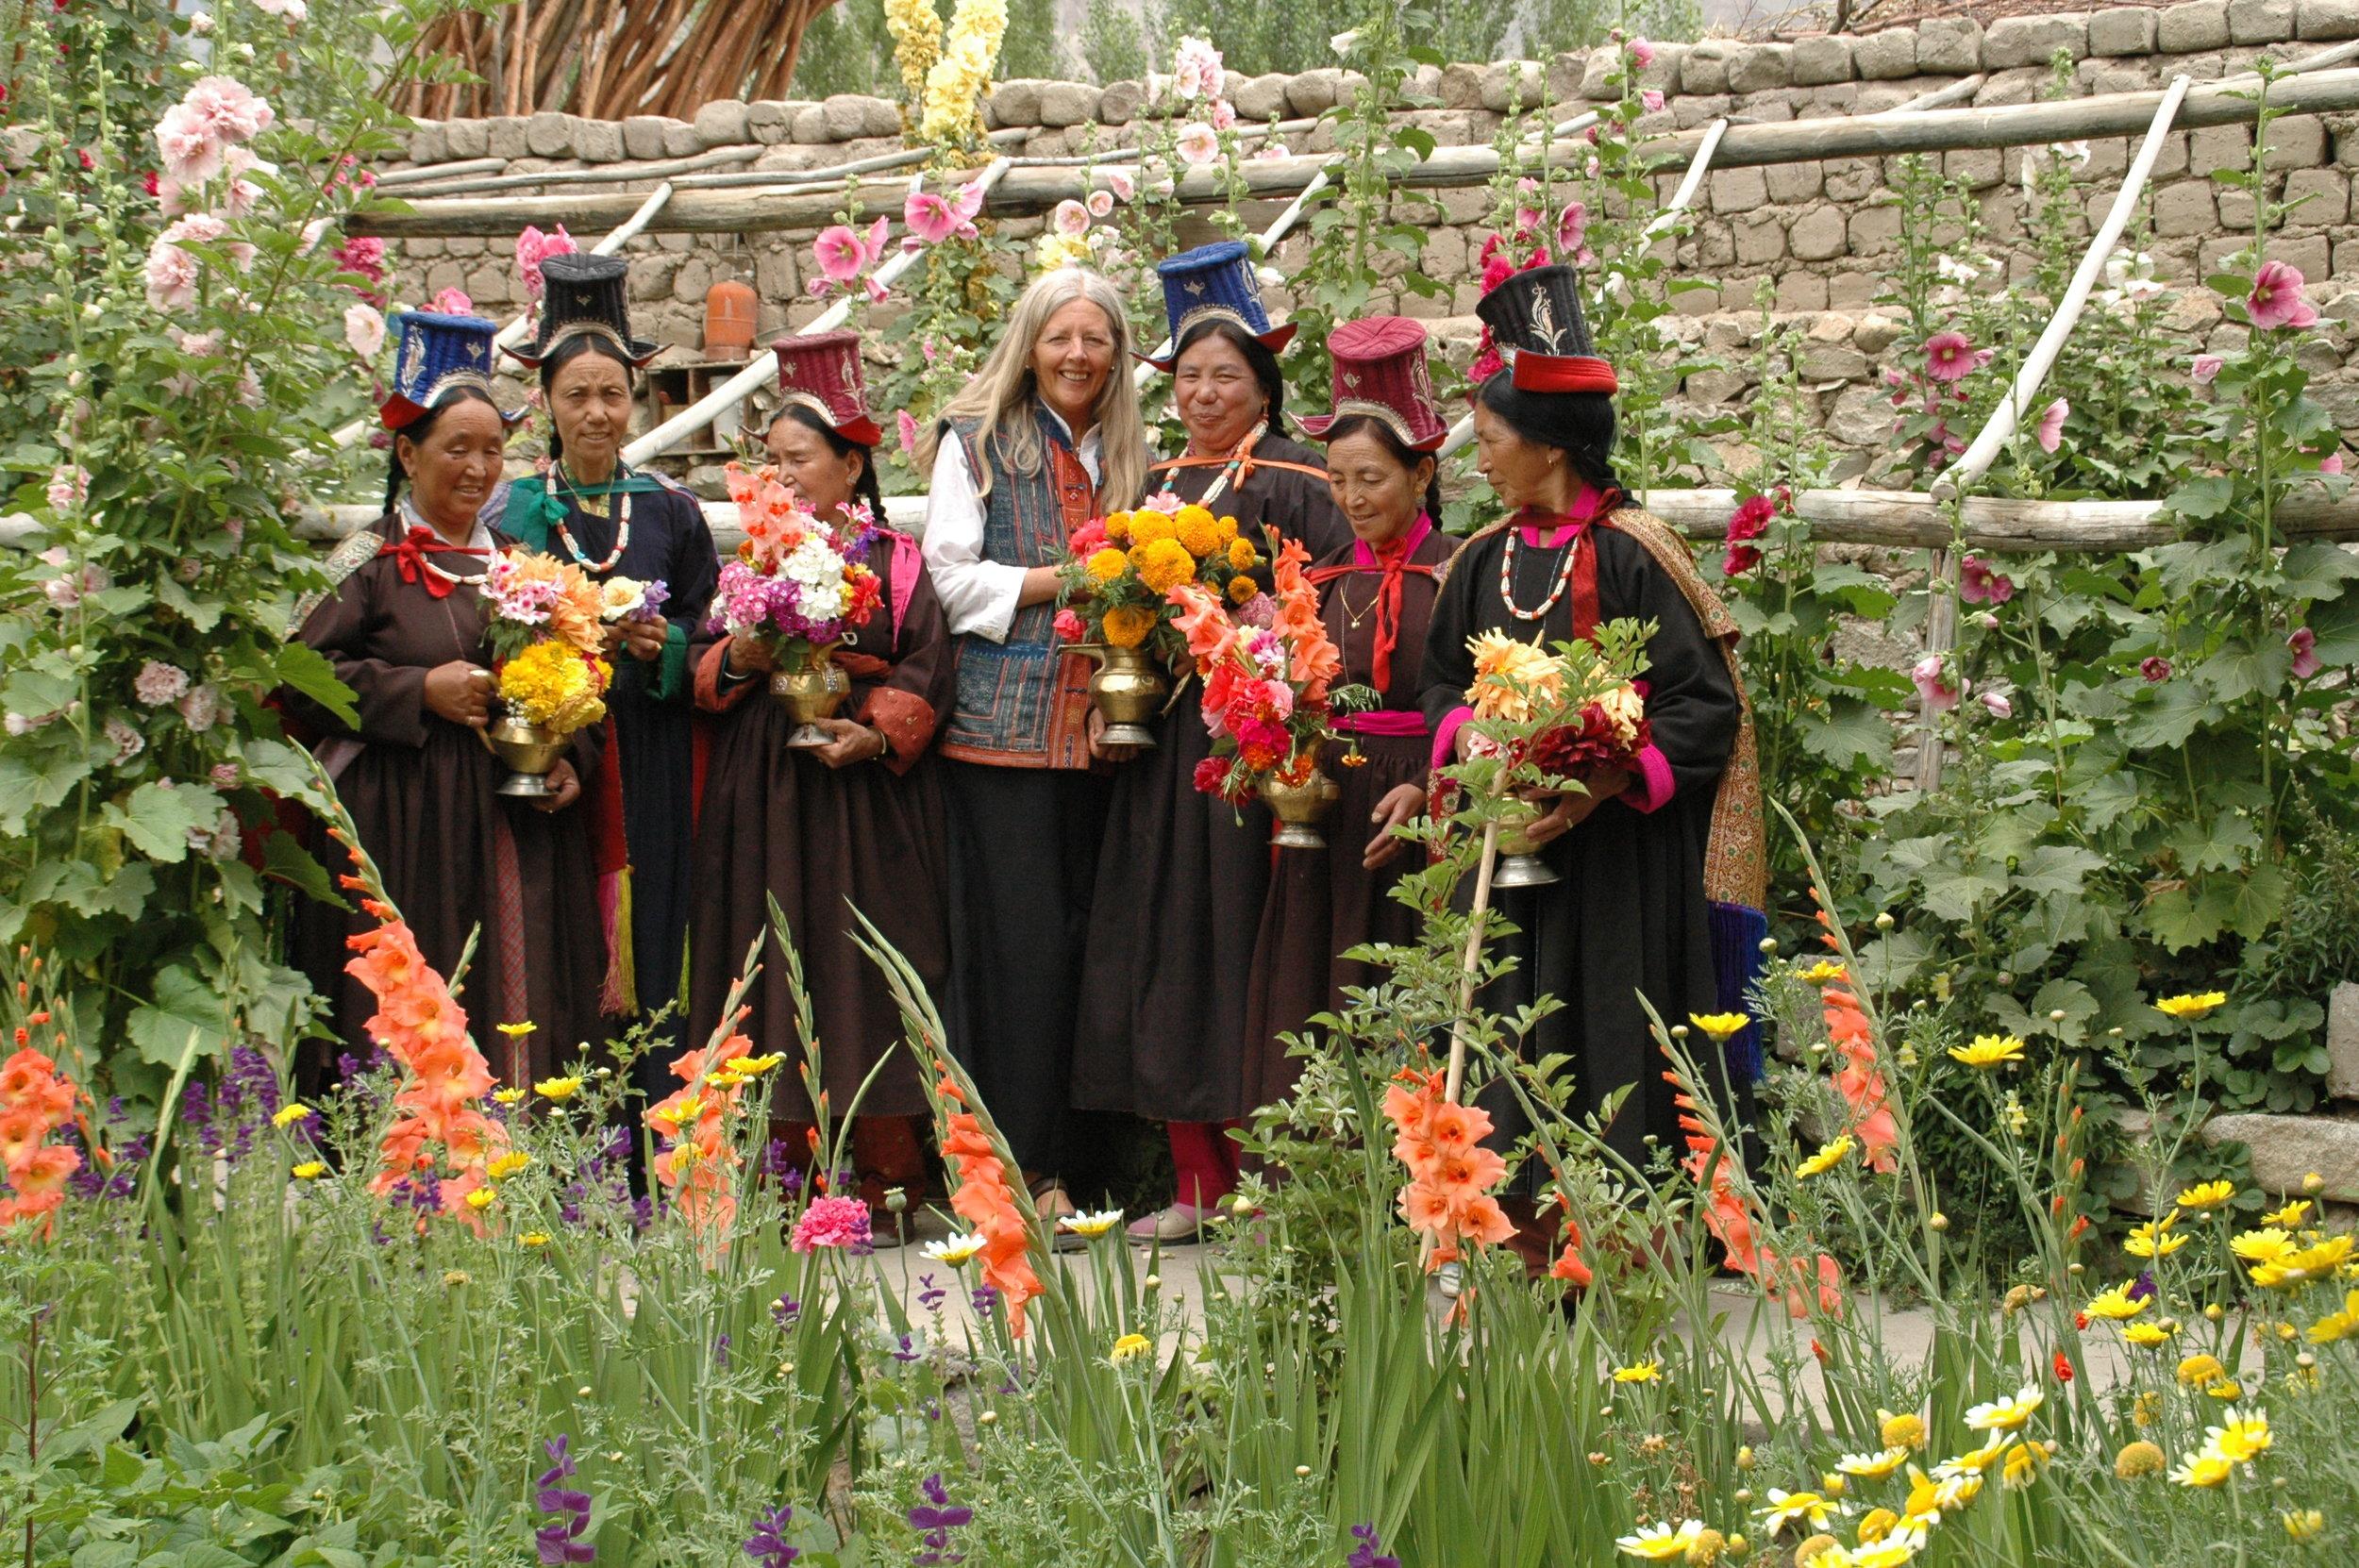 Helena and the Ama-les, Ladakh, India